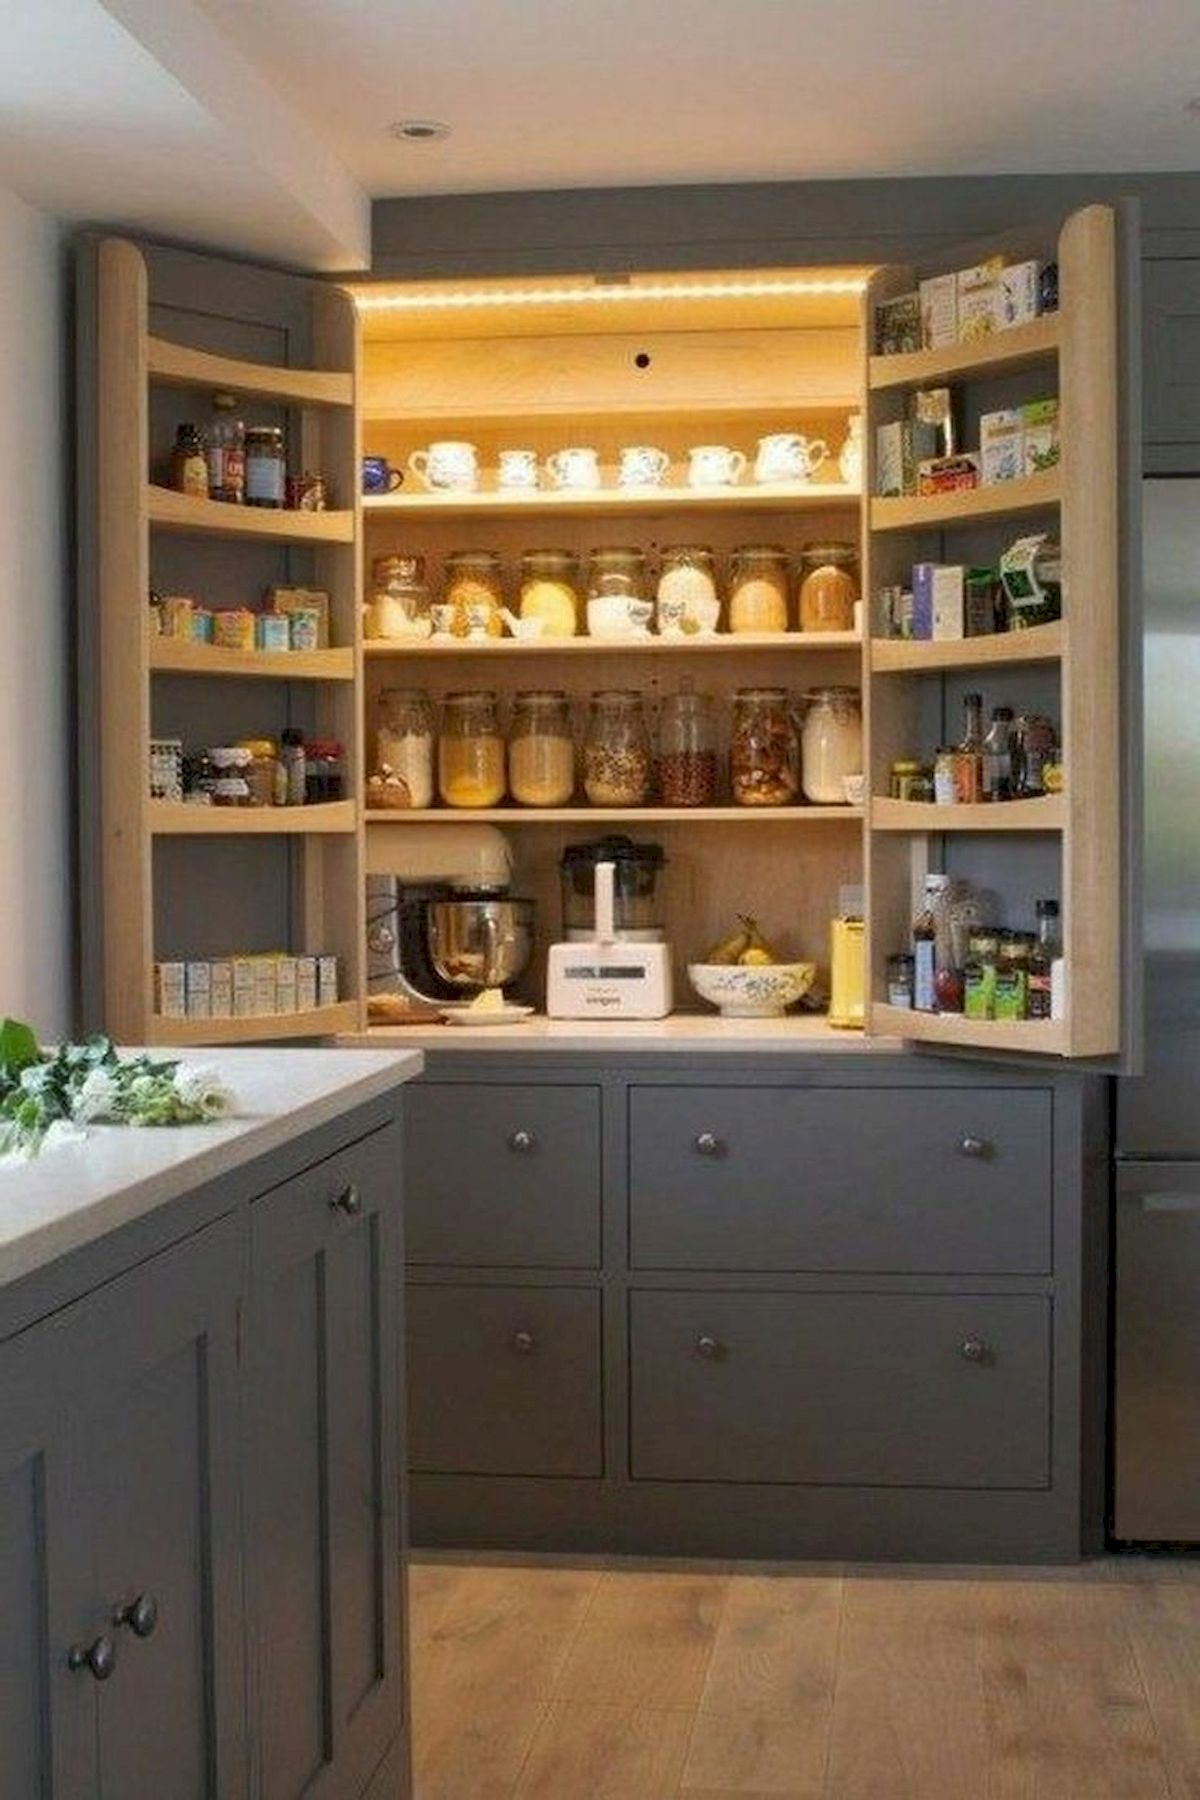 50 Cozy Farmhouse Kitchen Design And Decor Ideas (3)